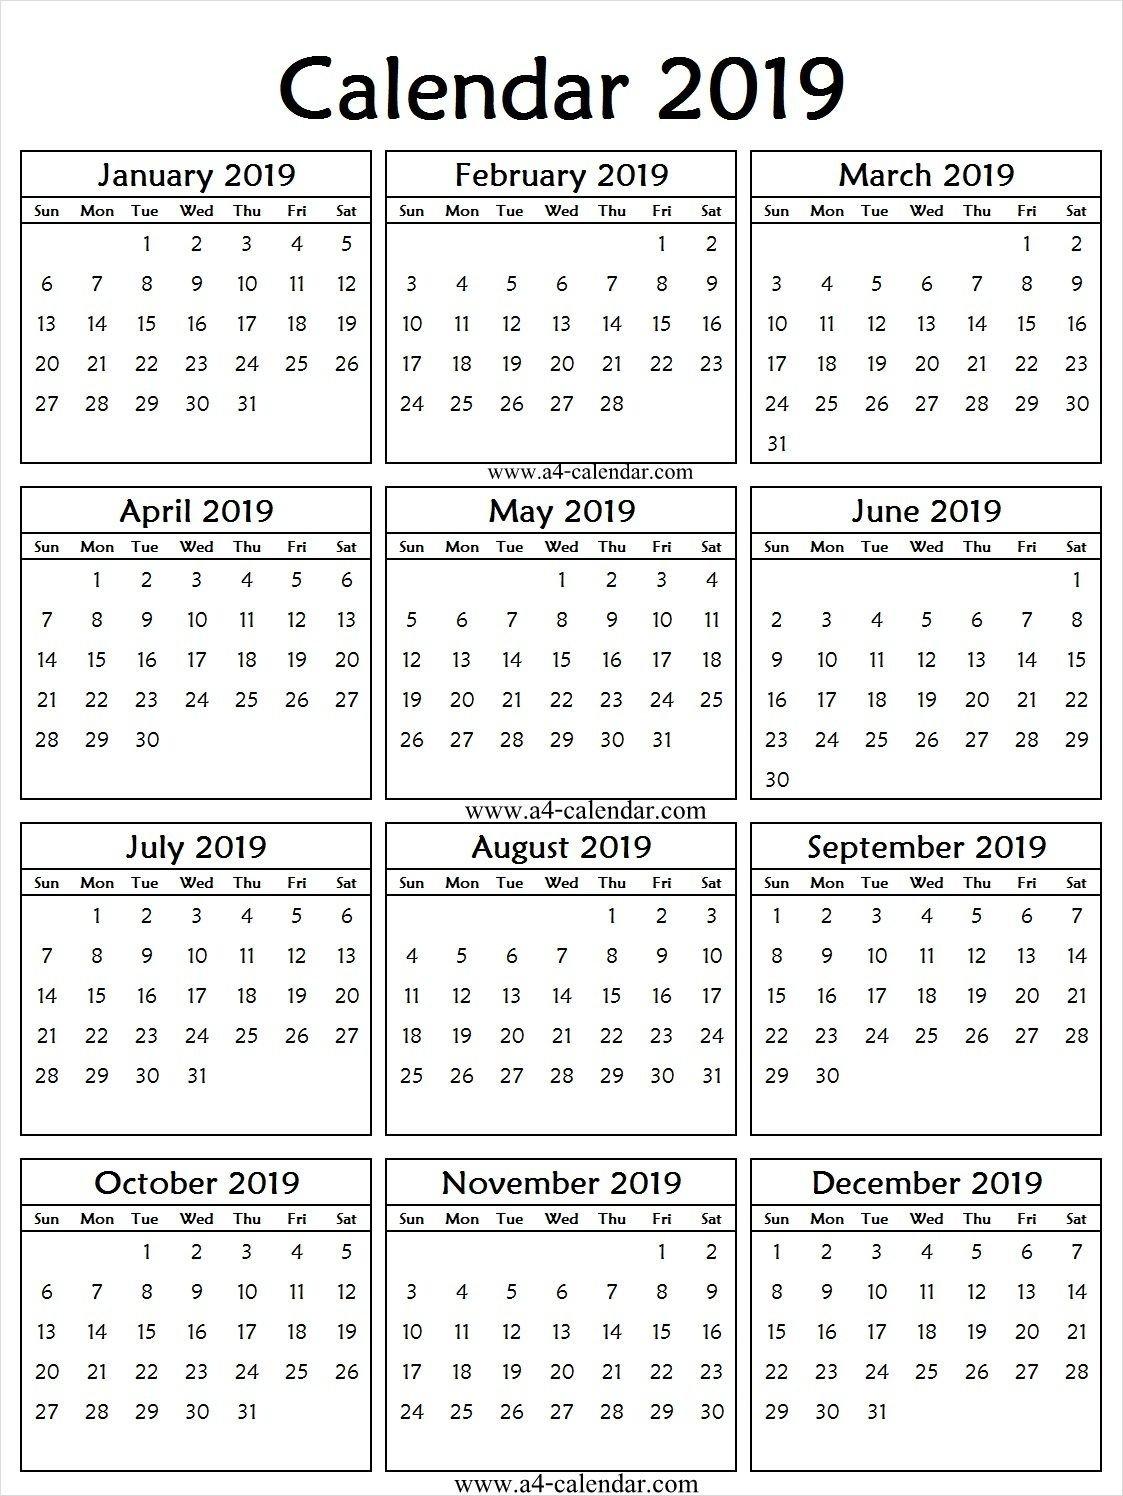 2019 Portrait Calendar Printable | 2019 Calendar Template | Calendar Calendar 2019 Portrait